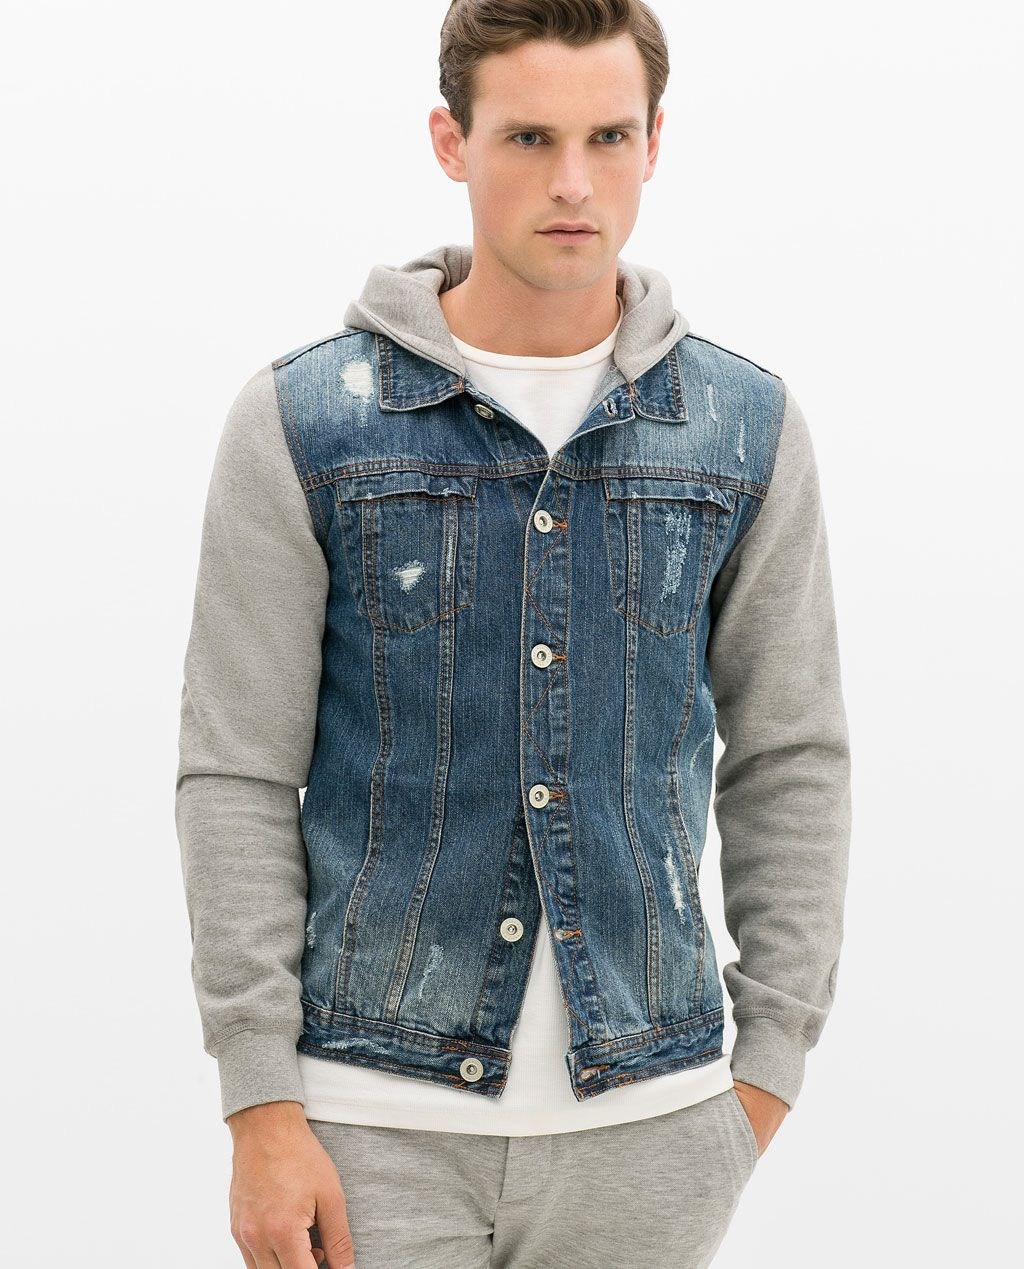 Image 2 Of Denim Jacket With Fleece Sleeves From Zara Pullover Und Jeans Jeansjacke Manner Jungs Hoodies [ 1269 x 1024 Pixel ]